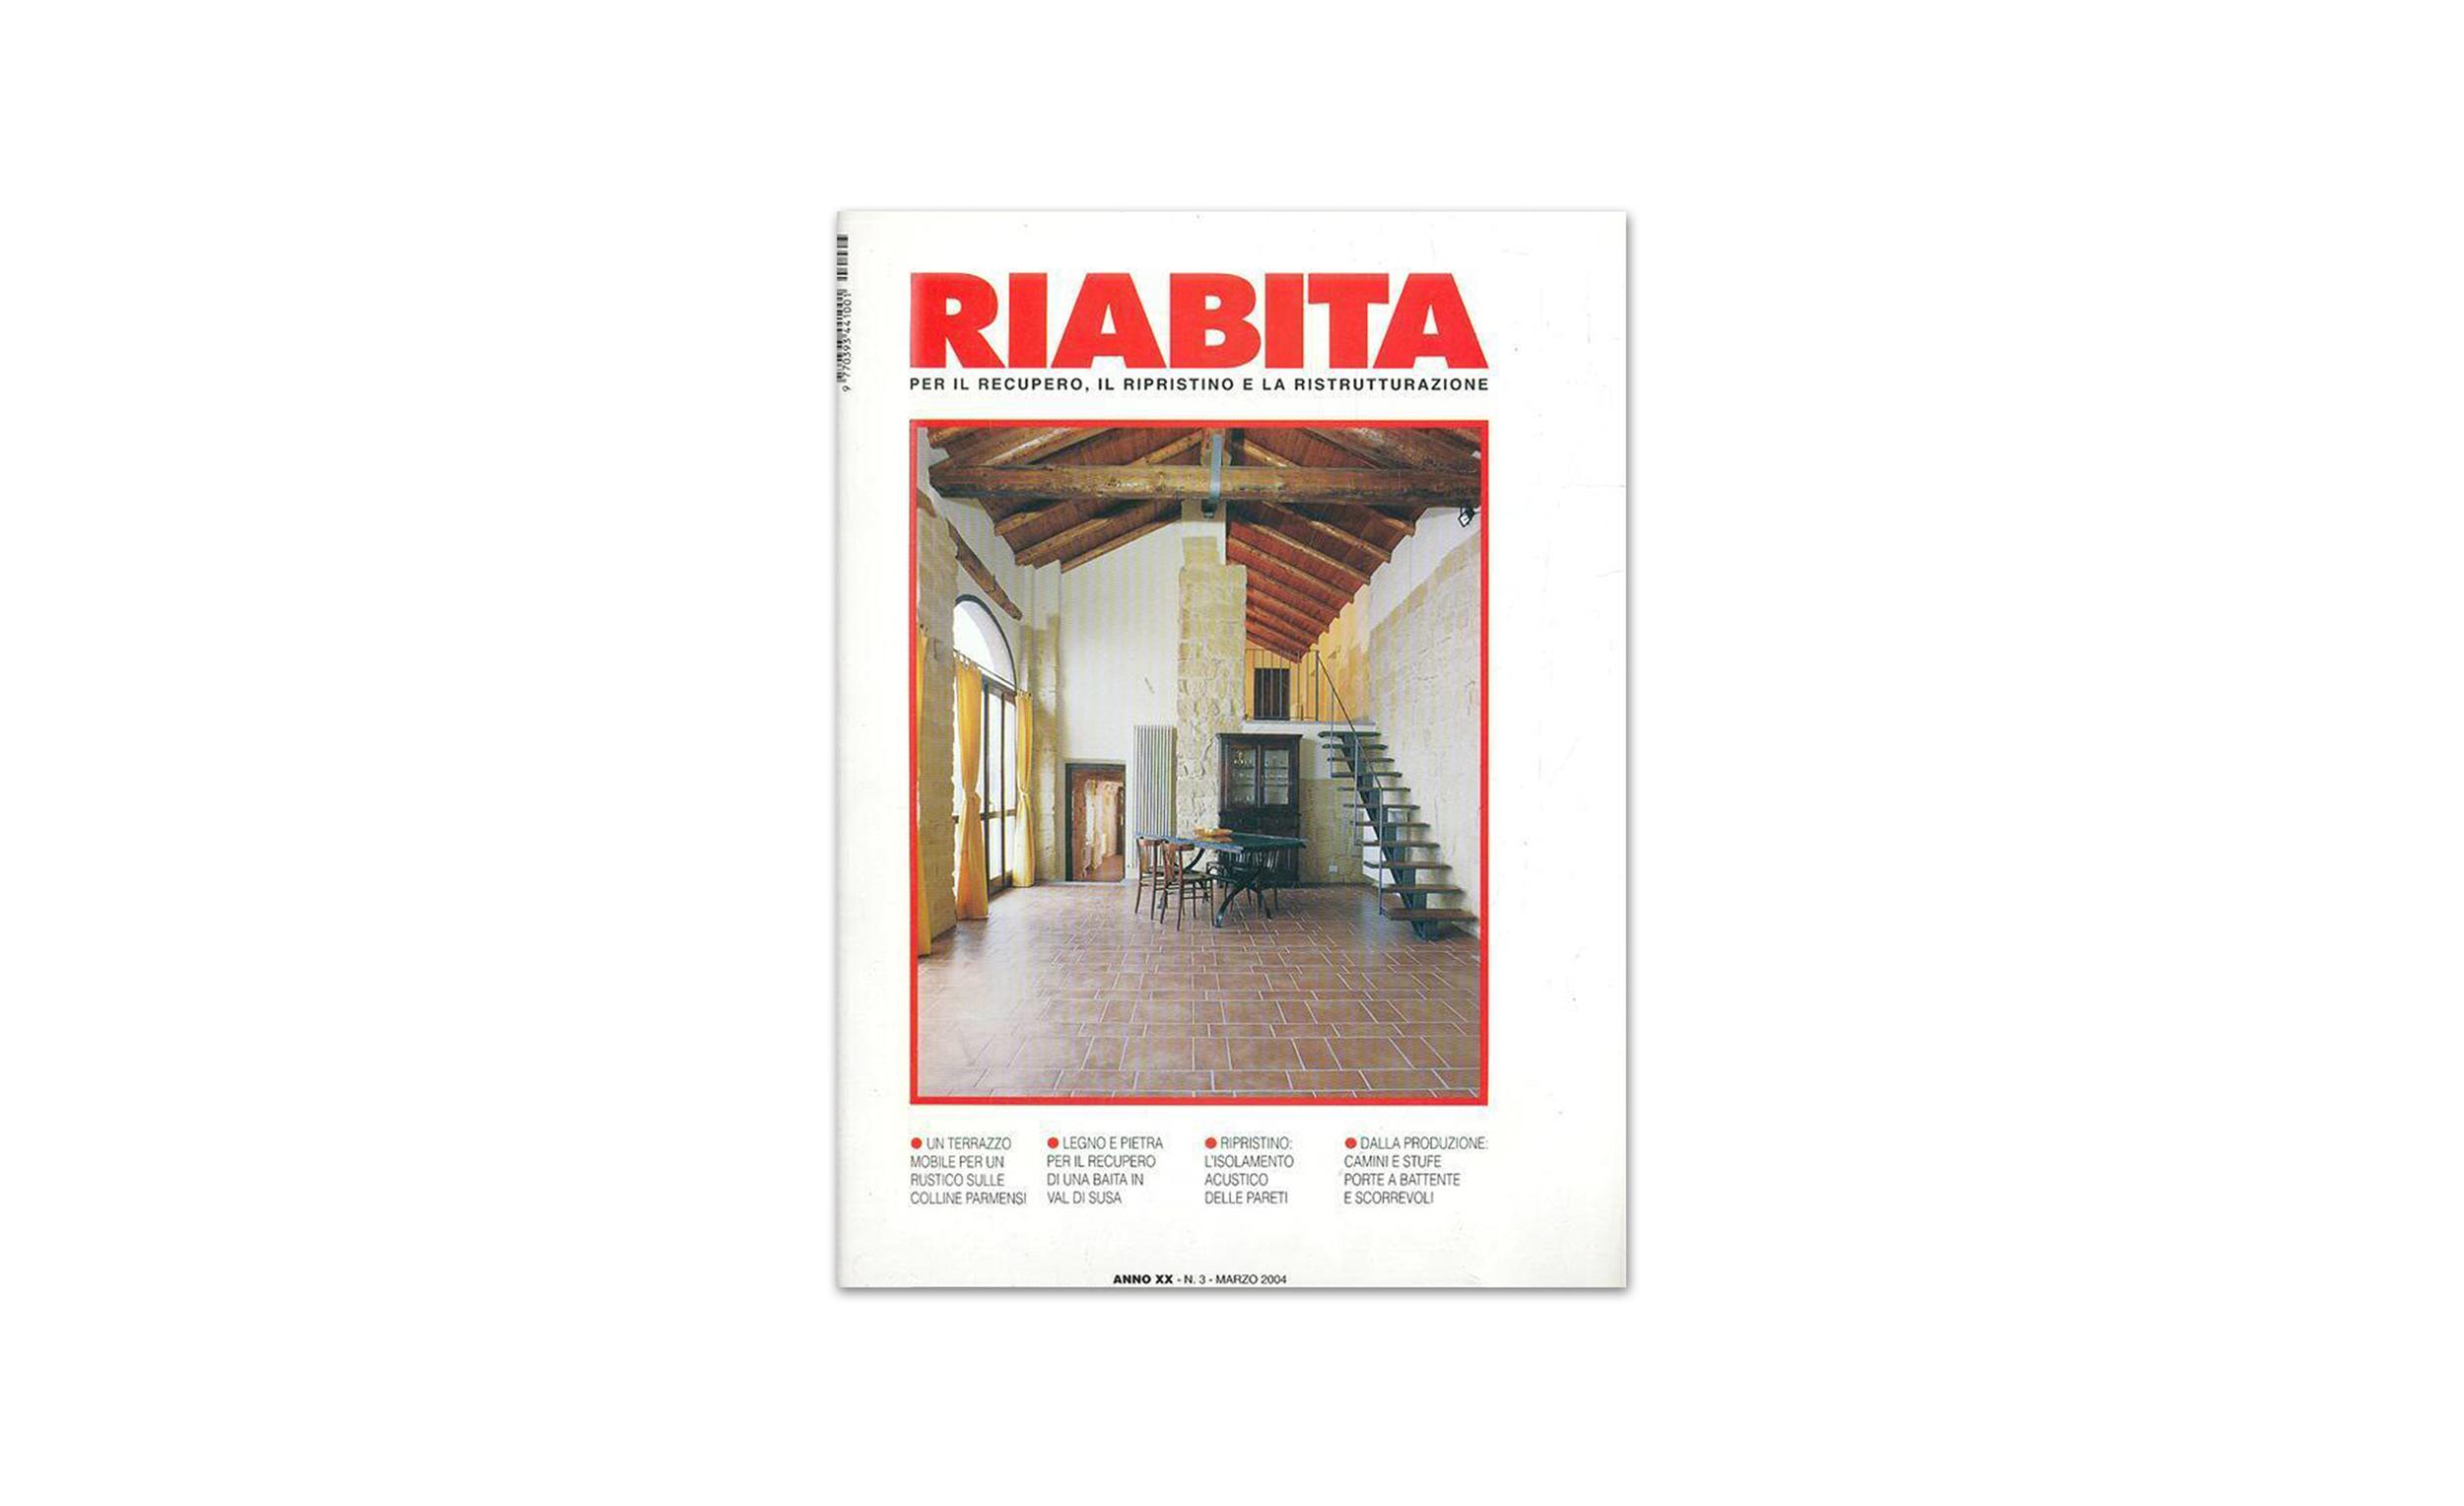 Riabita 2004 COVER.jpg